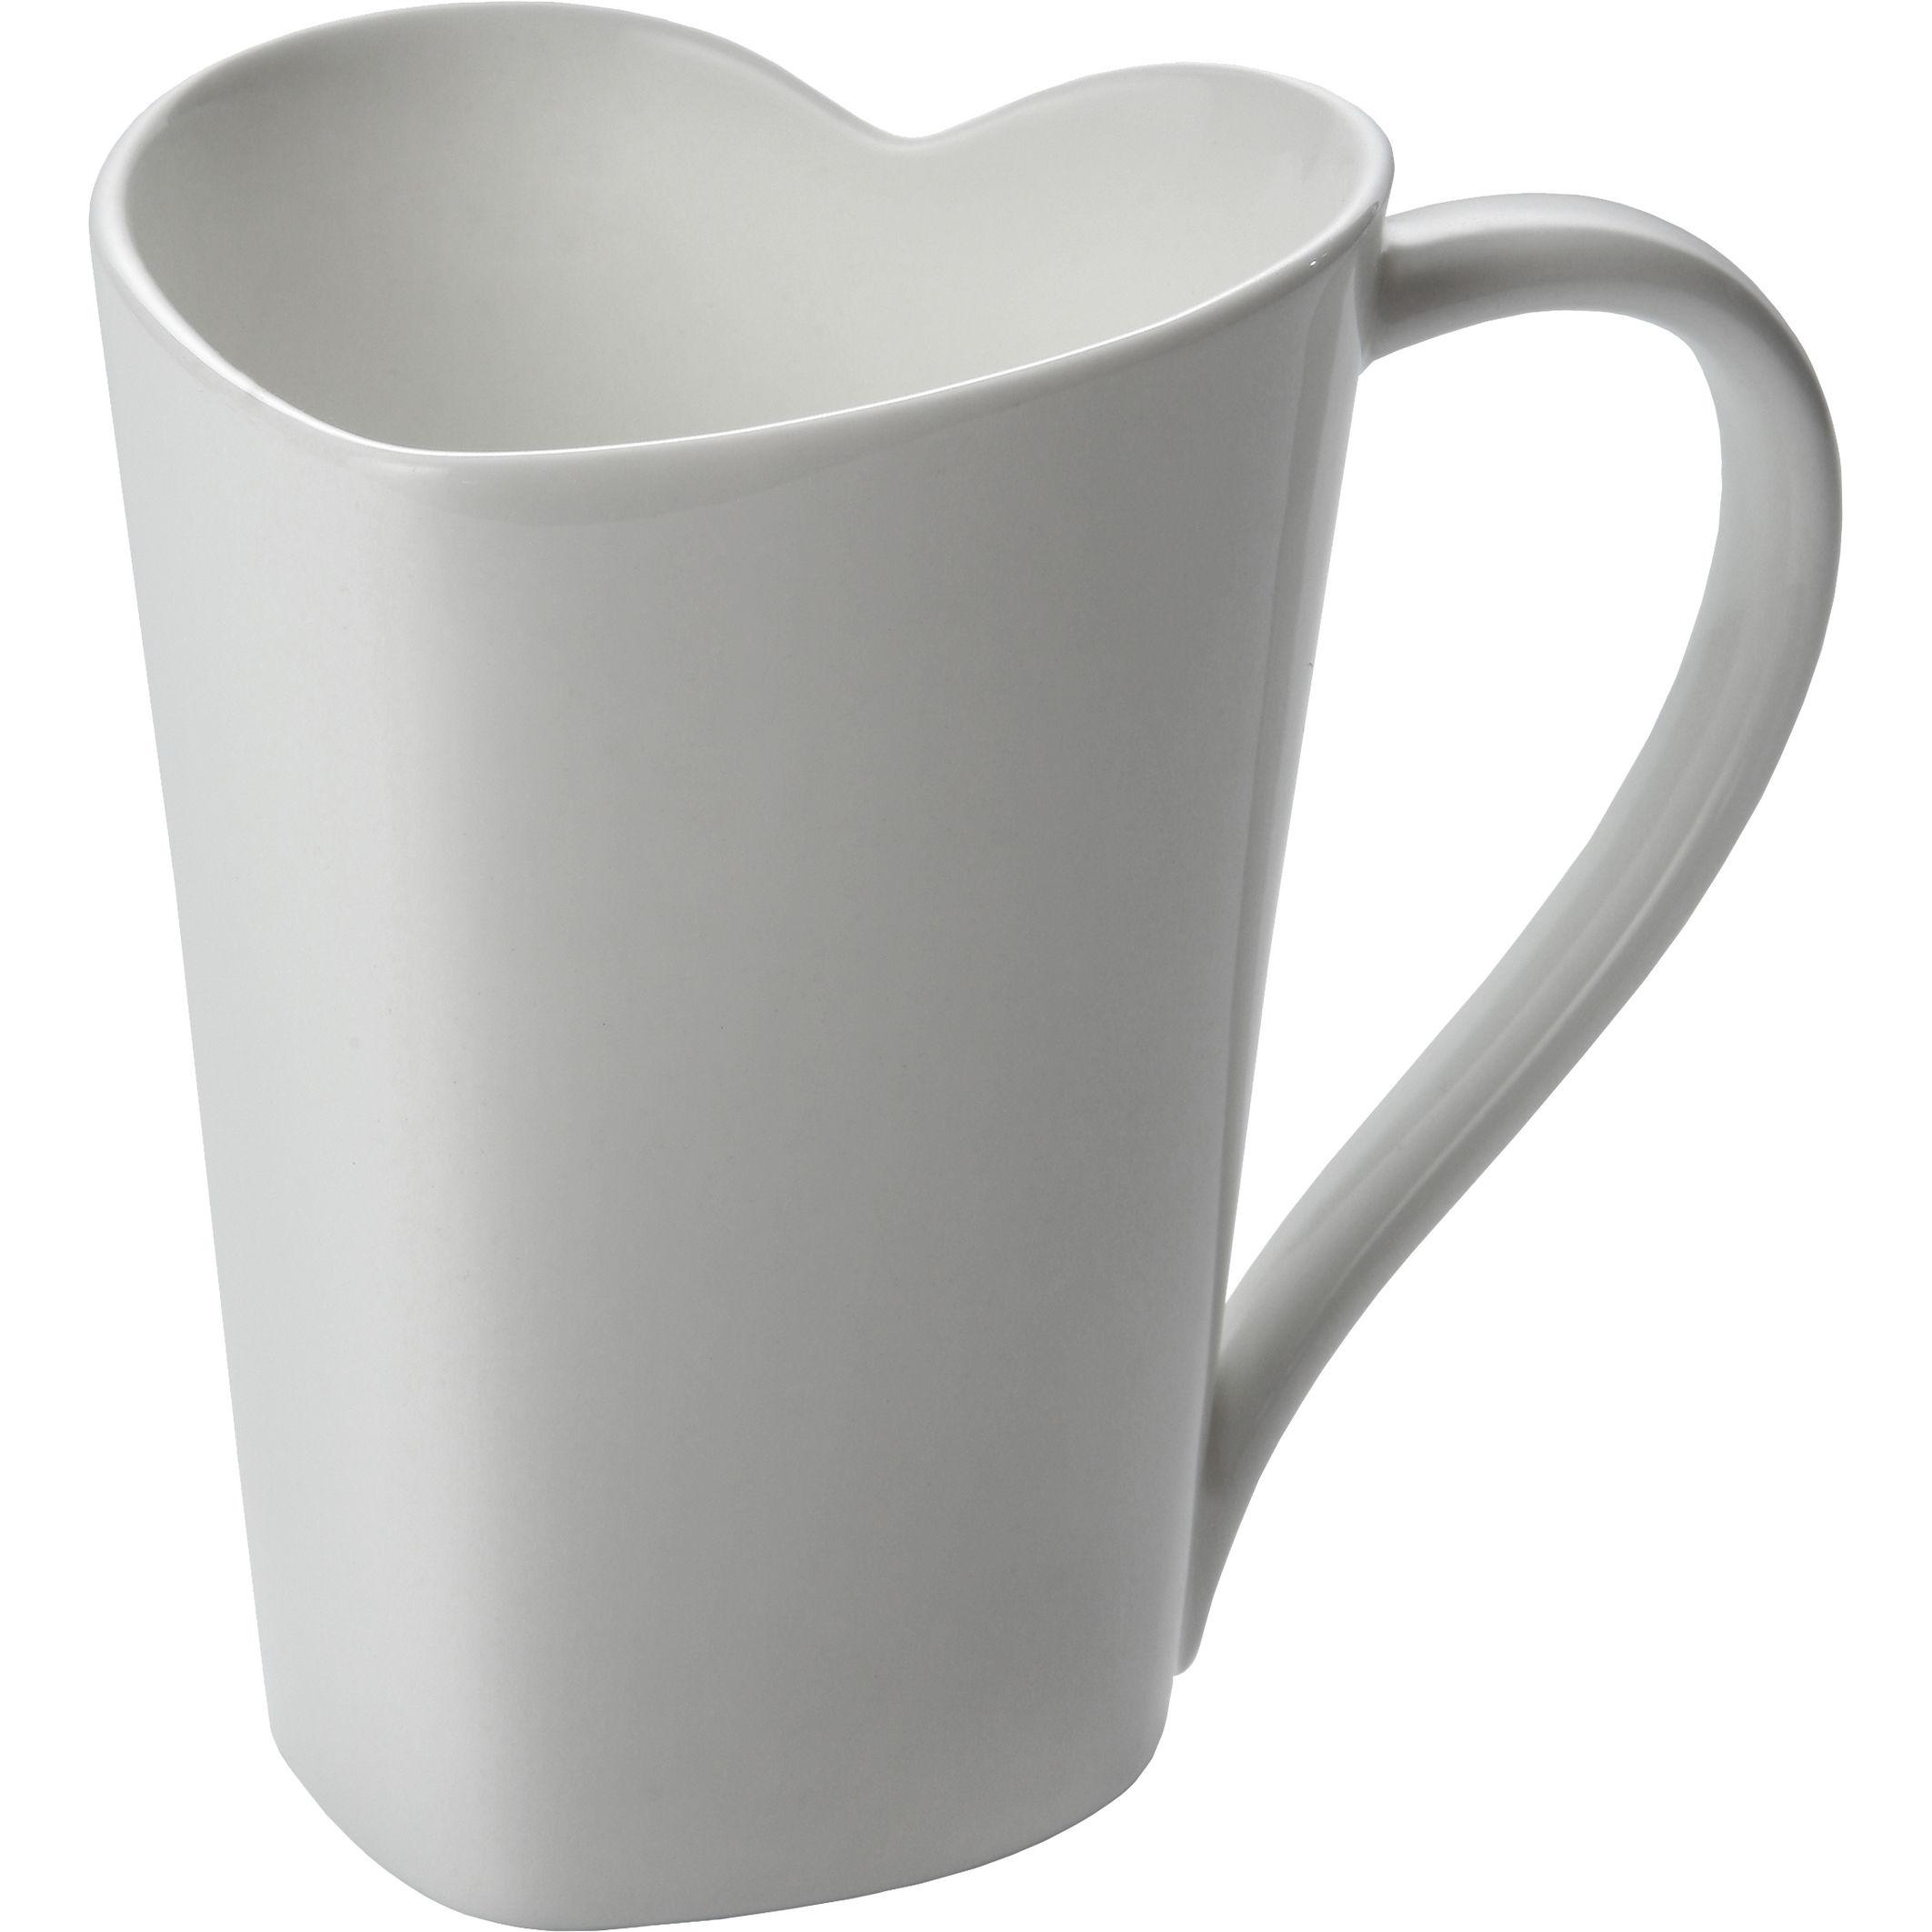 Tableware - Coffee Mugs & Tea Cups - To Mug by Alessi - White - Ceramic